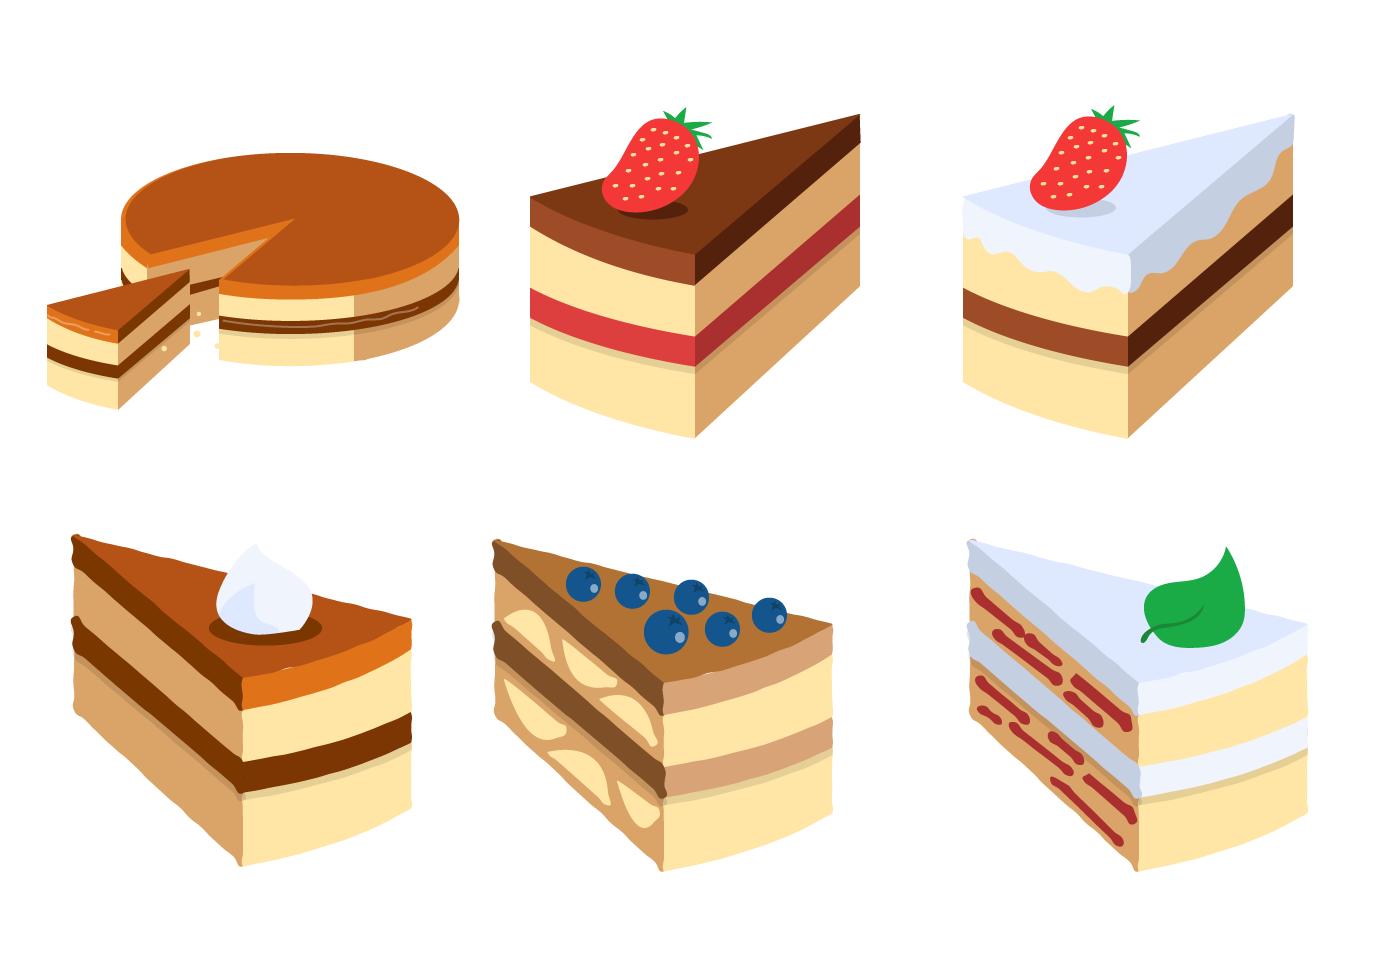 Cake Line Art Vector Free Download : Cake Slice Vector Set - Download Free Vector Art, Stock ...